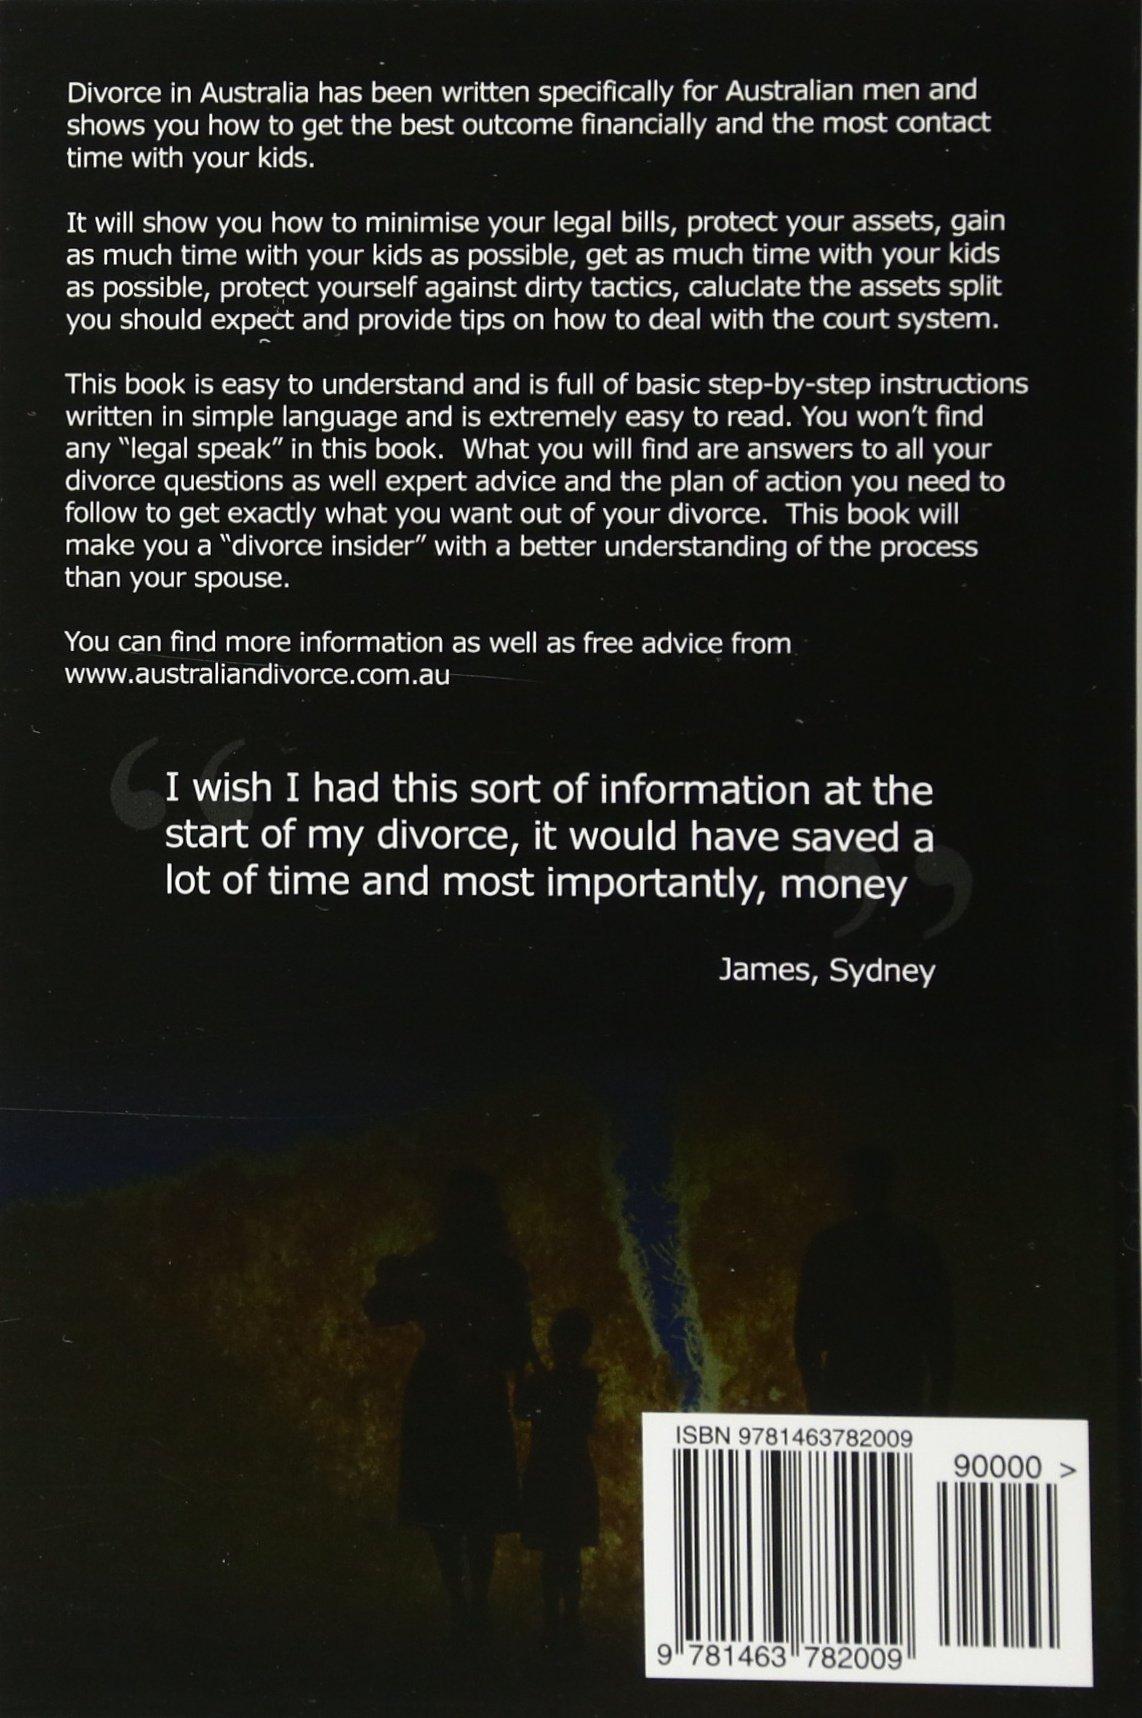 Buy divorce in australia a guide for australian men volume 1 book buy divorce in australia a guide for australian men volume 1 book online at low prices in india divorce in australia a guide for australian men volume solutioingenieria Images